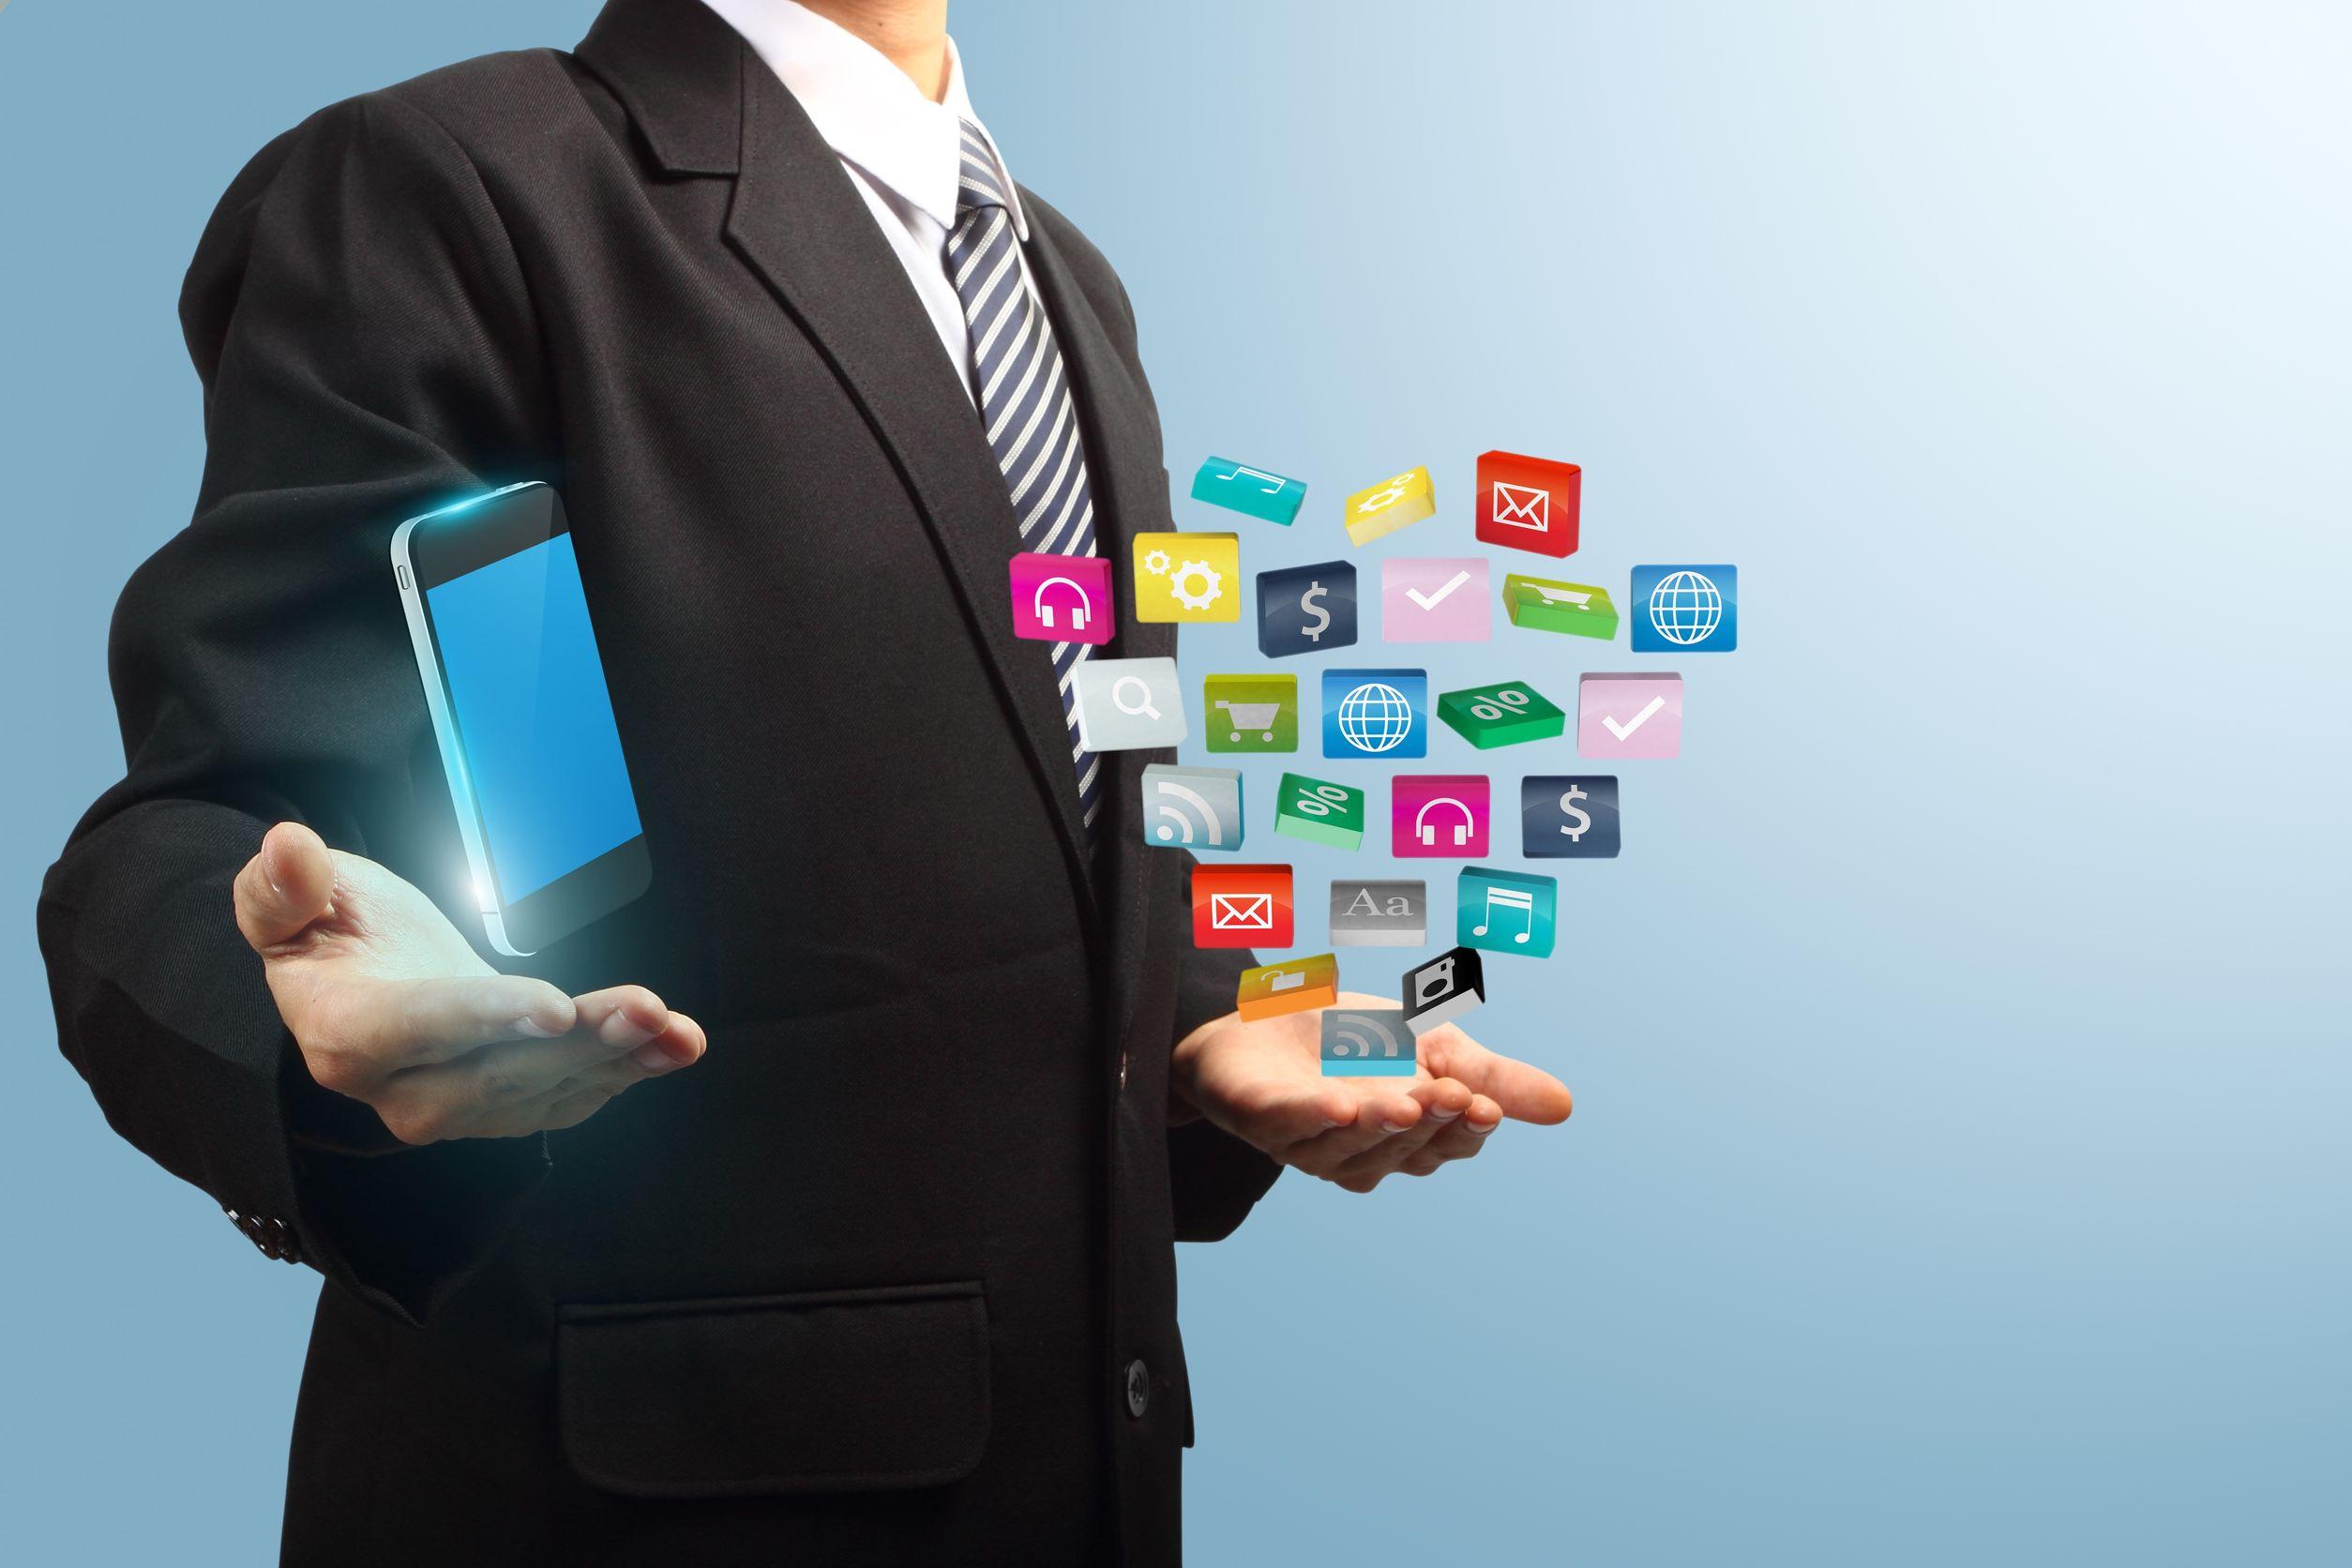 2018_07_12_P2_虛實整合時代,如何利用網路行銷工具貼近受眾生活